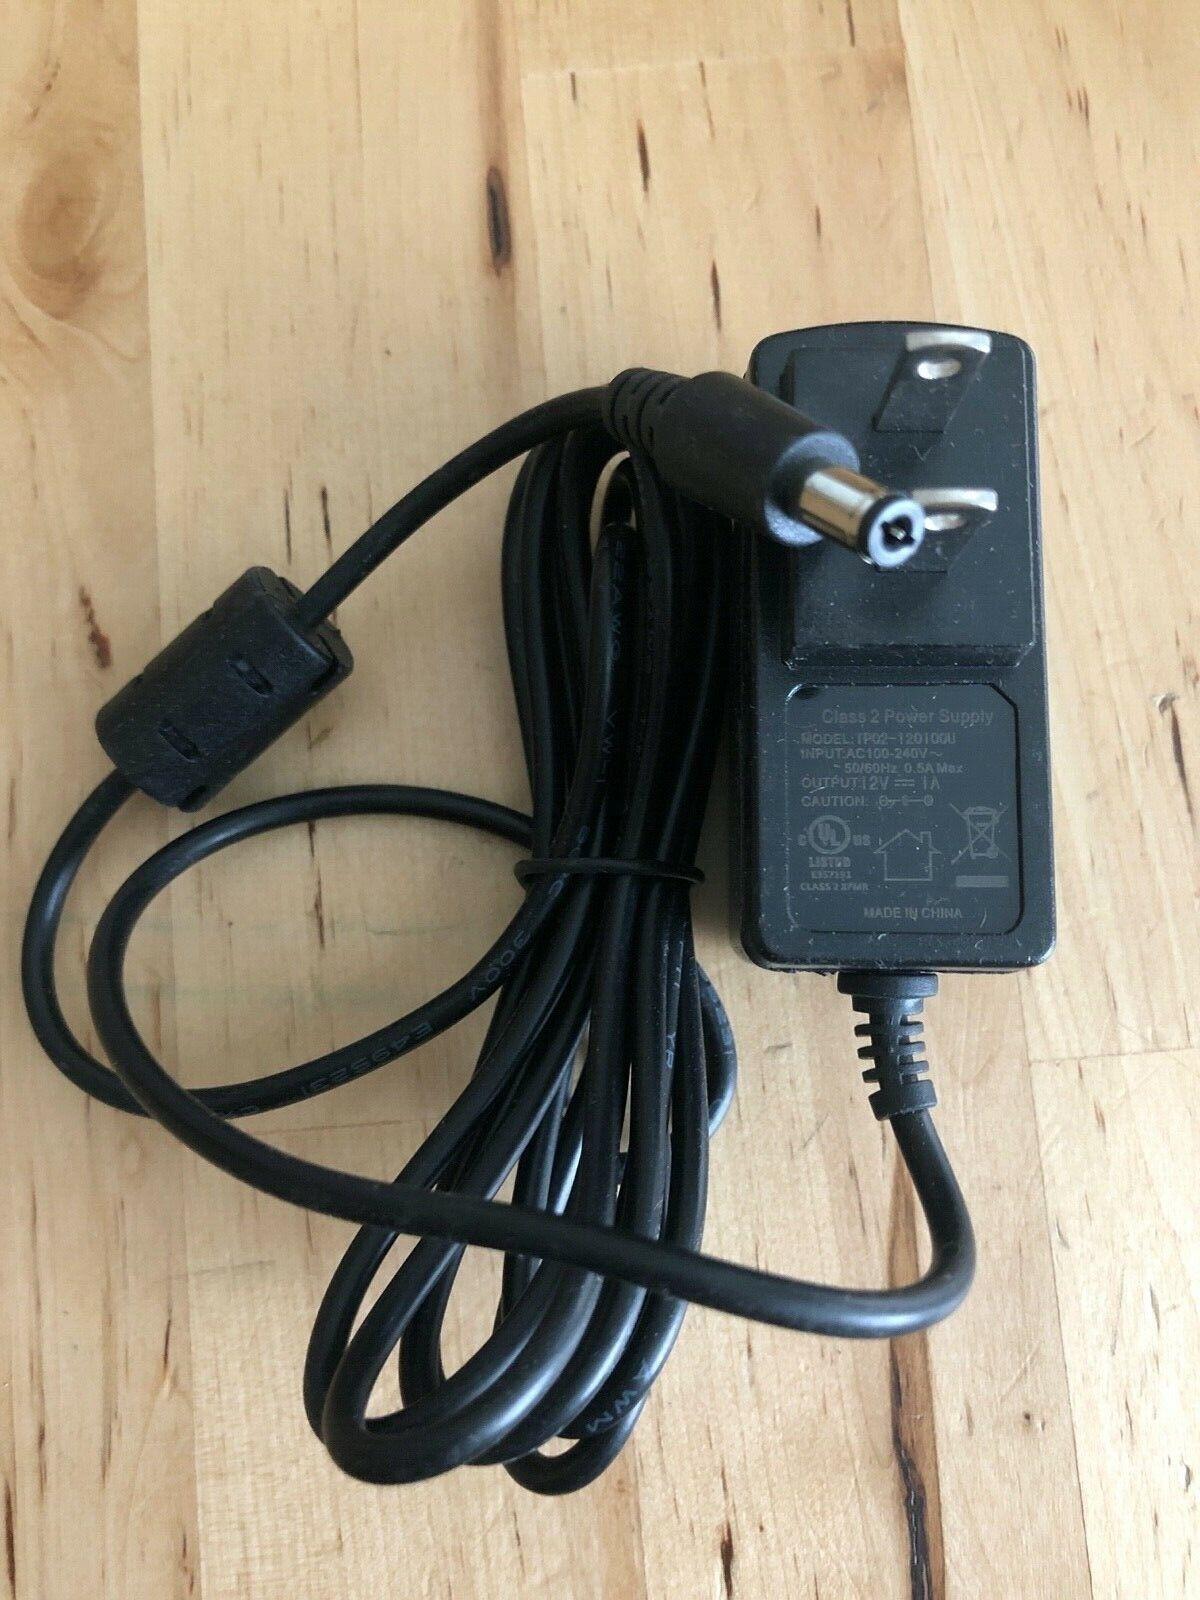 Class 2 Power Supply TP02-120100U AC Adapter 12V 1A New